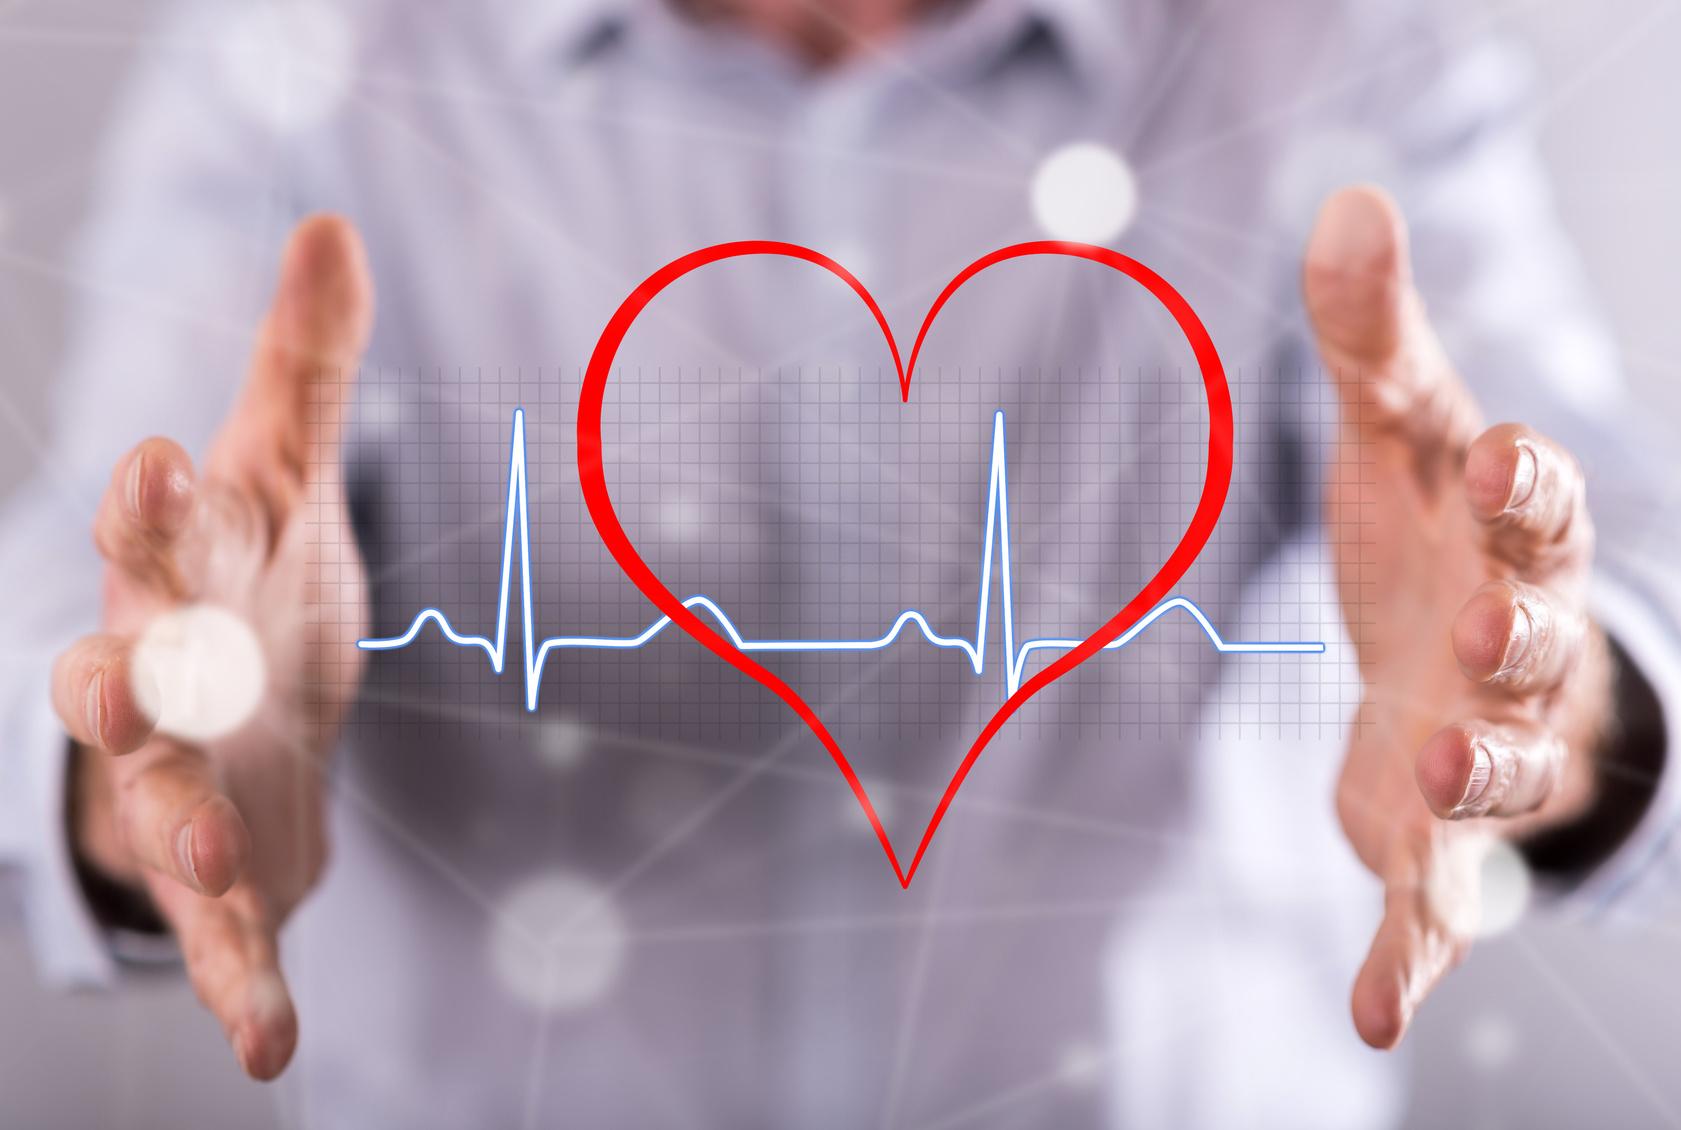 Нарушение сердечного ритма и проводимости